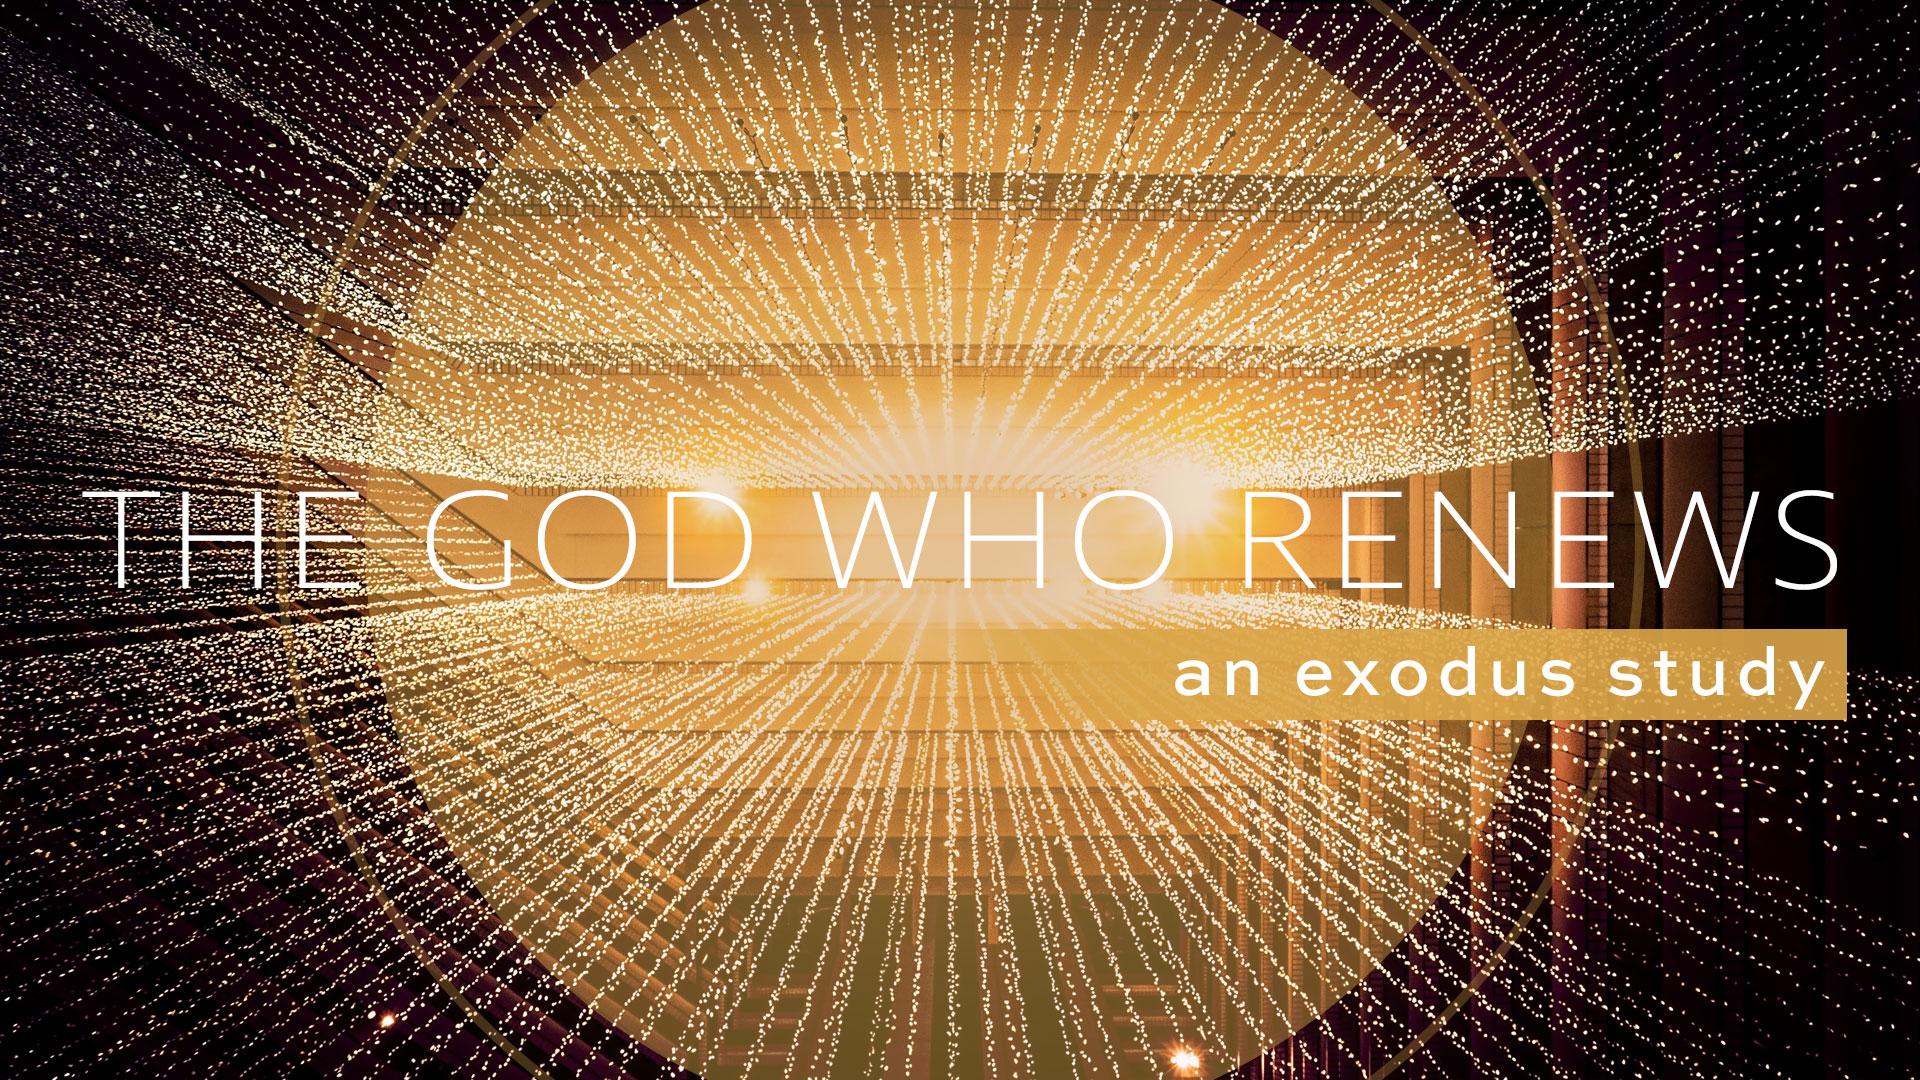 Exodus-GodWhoRenews-title.jpg